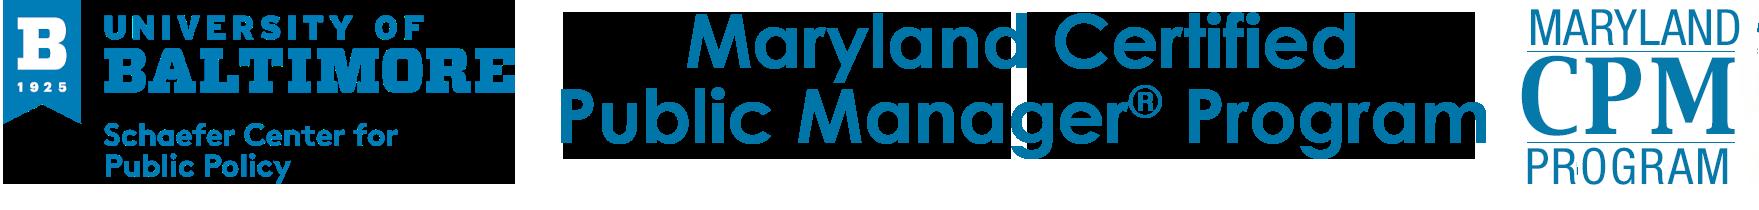 Maryland Certified Public Manager® Program Logo